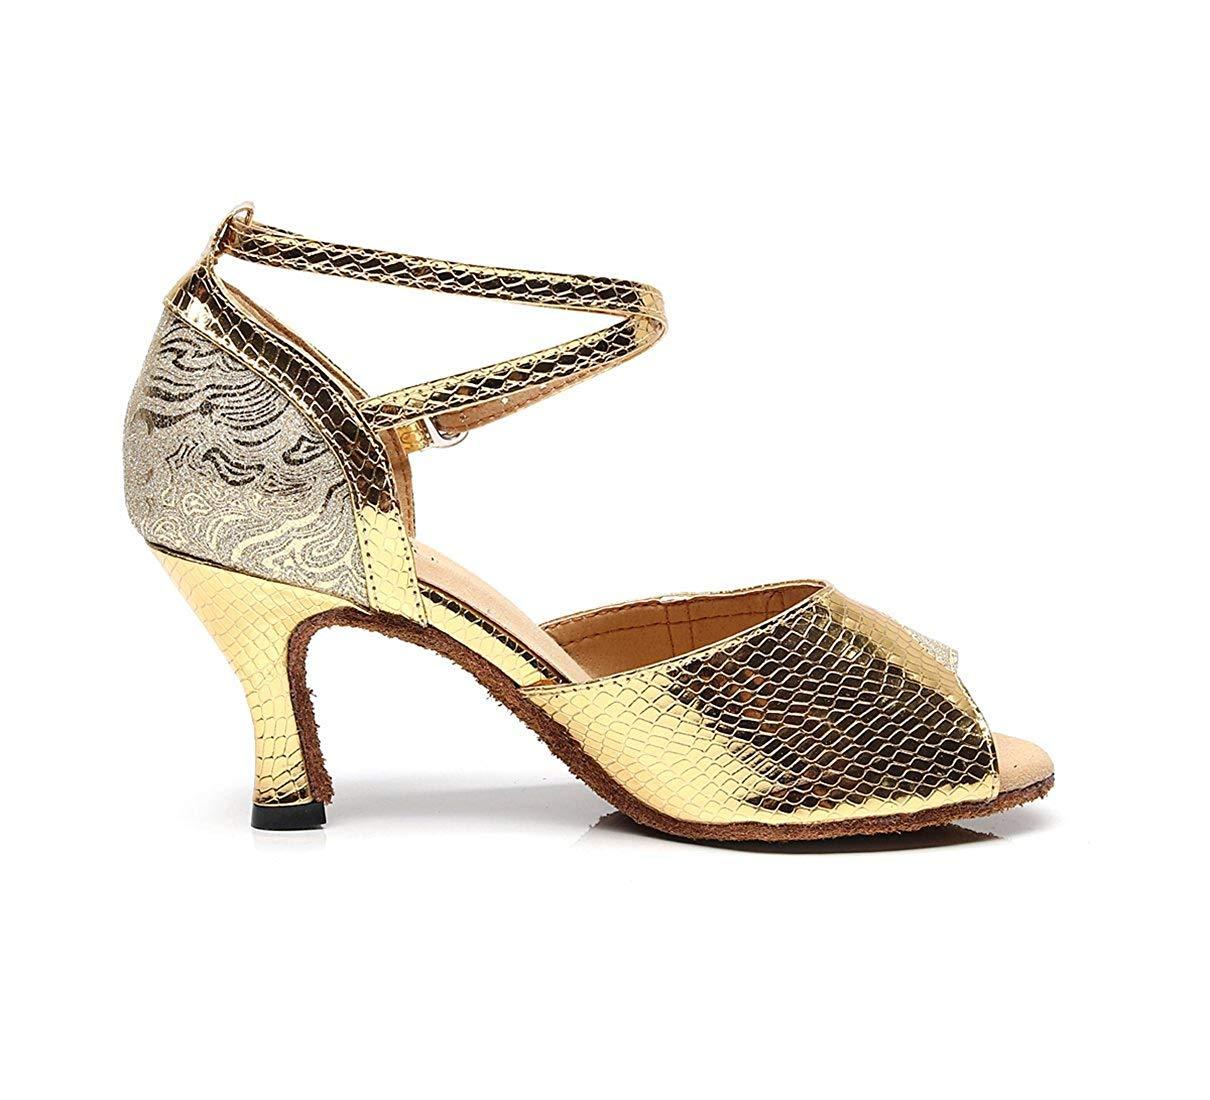 ZHRUI Damen Handgemachte Mode Knöchelriemen Gold Synthetische Latin Salsa Salsa Salsa Ballroom Tanzen Sandalen UK 2 (Farbe   Silber-3.35  Heel Größe   -) 9e5629